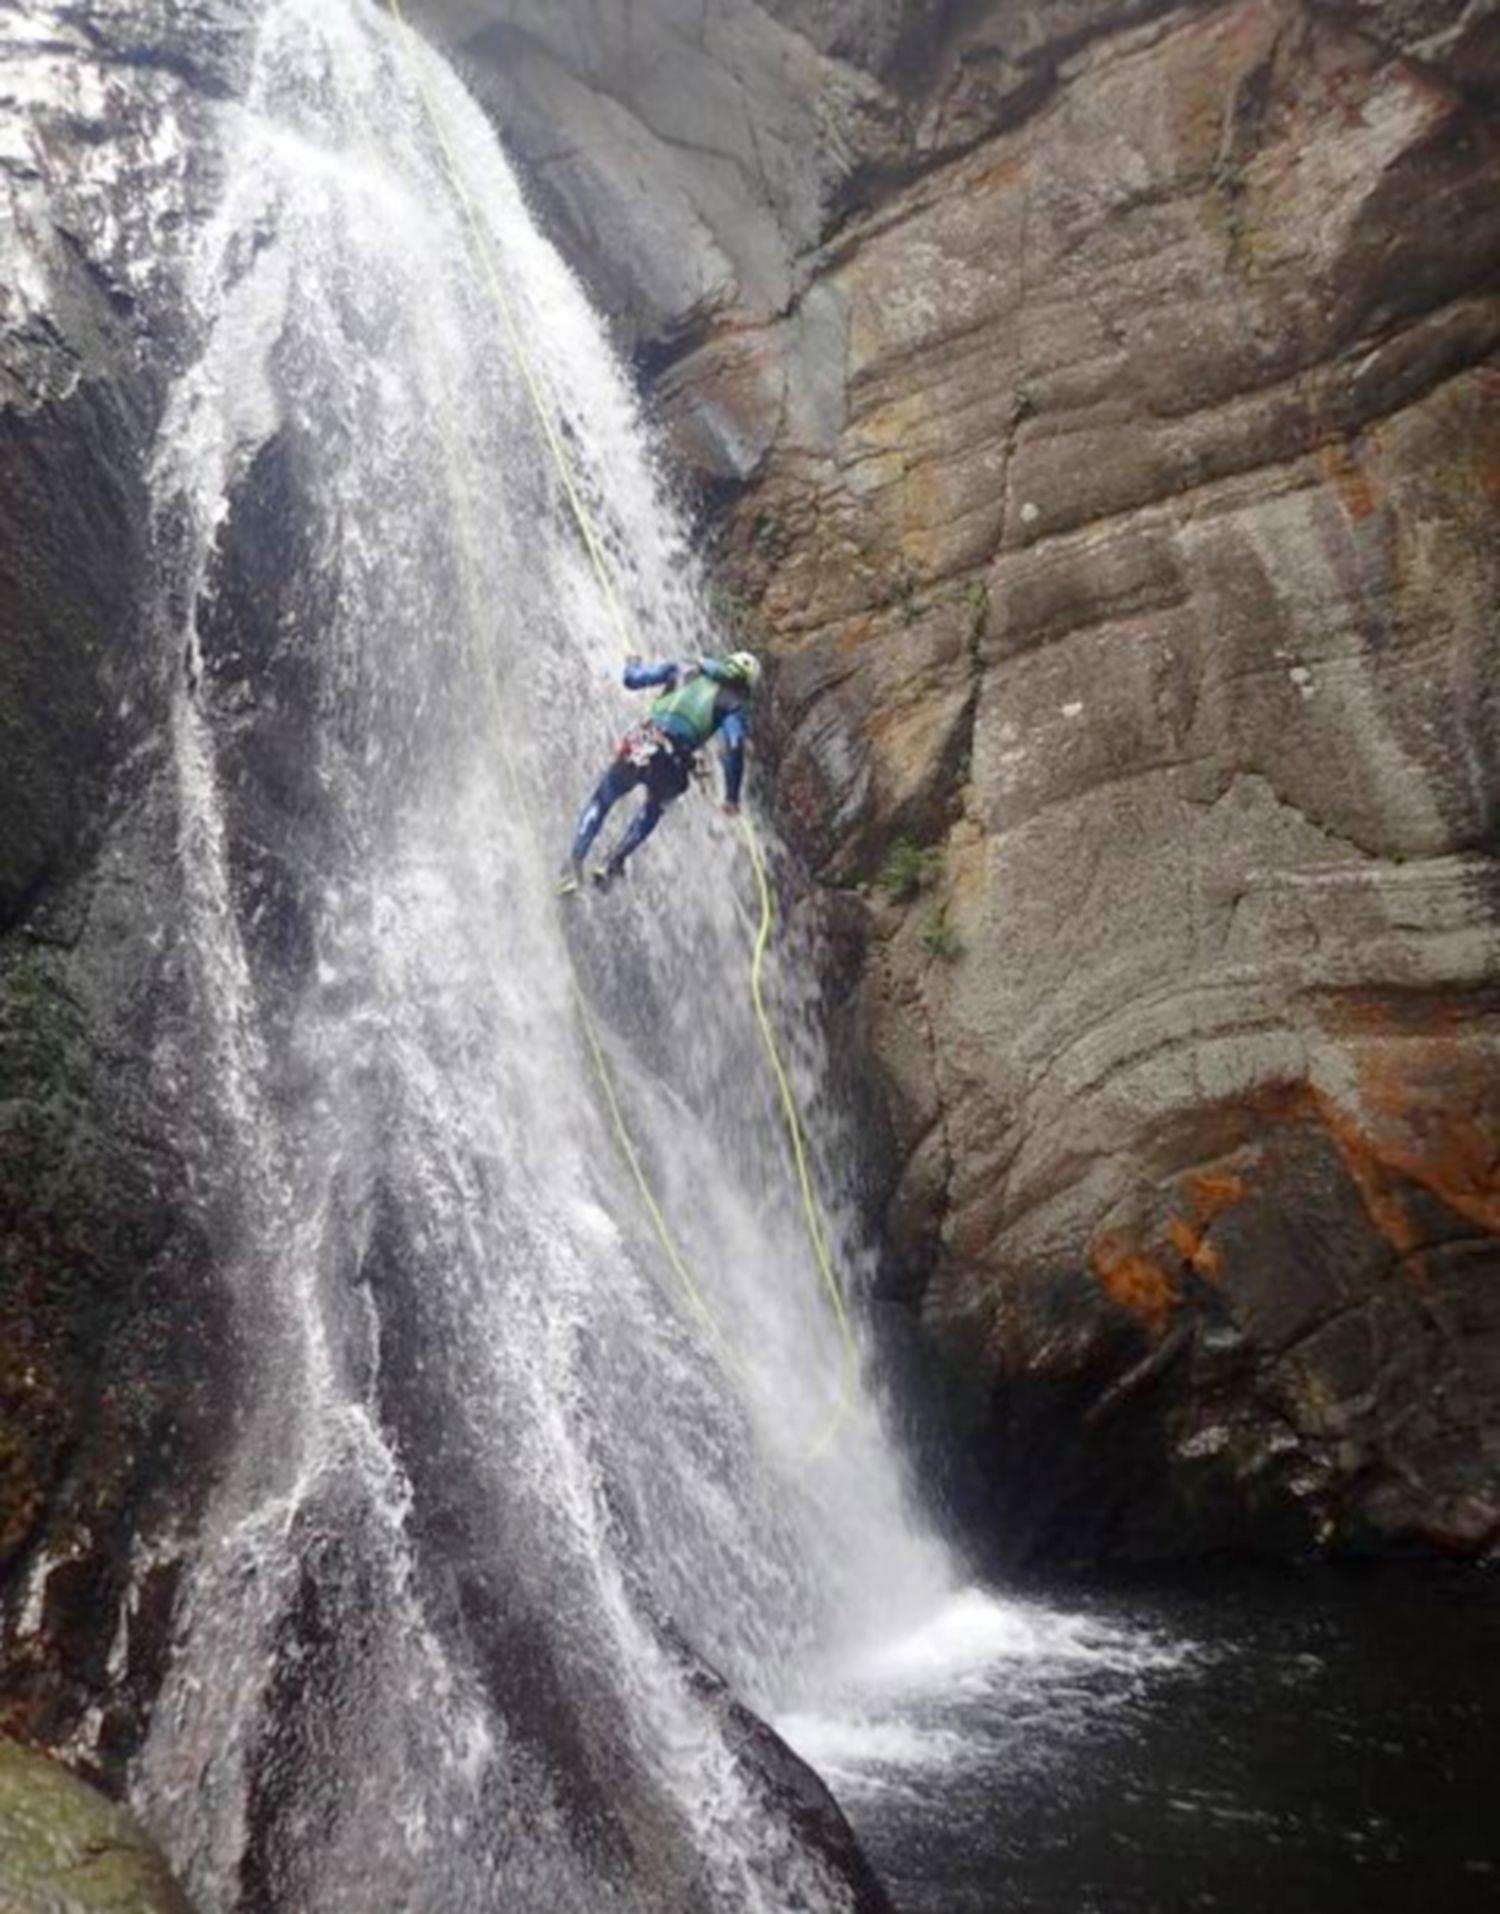 de cascade du llec canyon baranquisme hotel llech pres de prades